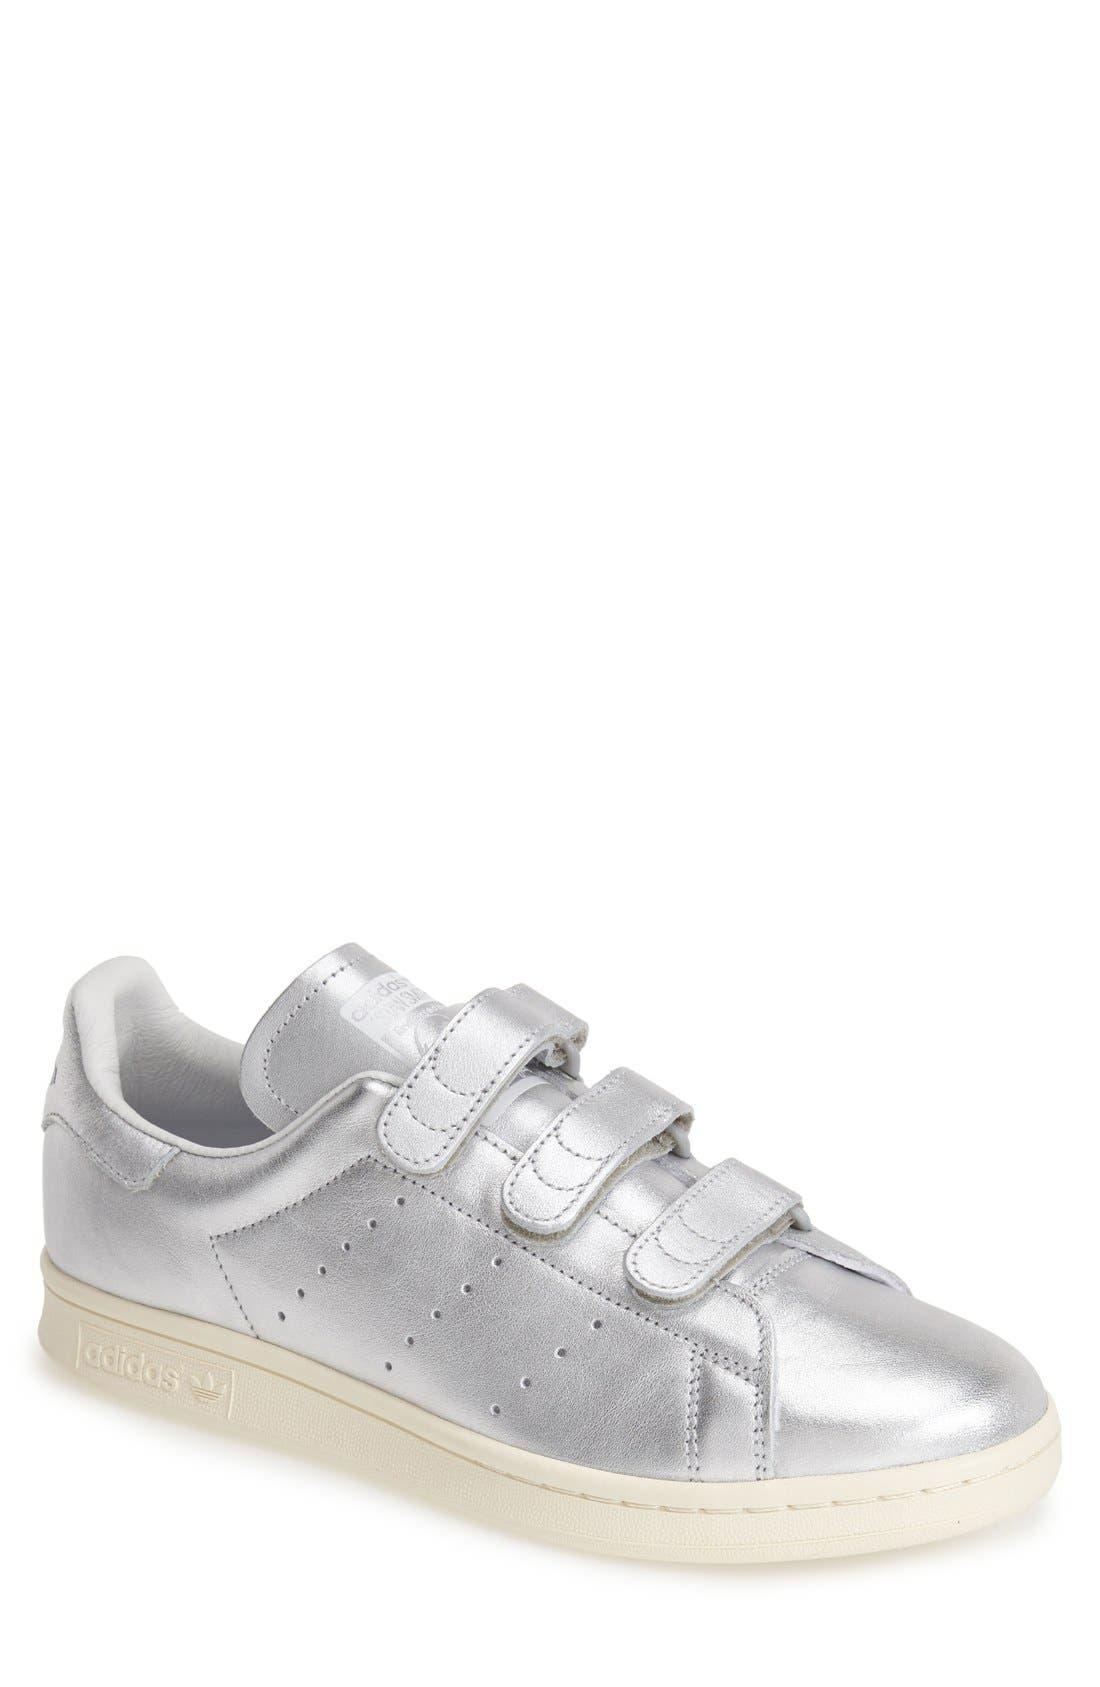 Main Image - adidas \u0027Stan Smith CF Nigo\u0027 Leather Sneaker (Men)